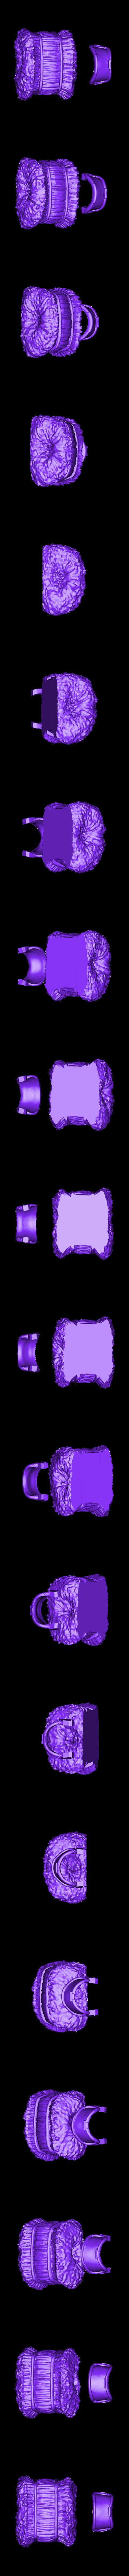 MP_Tessa_Accessories_.stl Download free STL file Tessa the Pony • Object to 3D print, MagicEddy